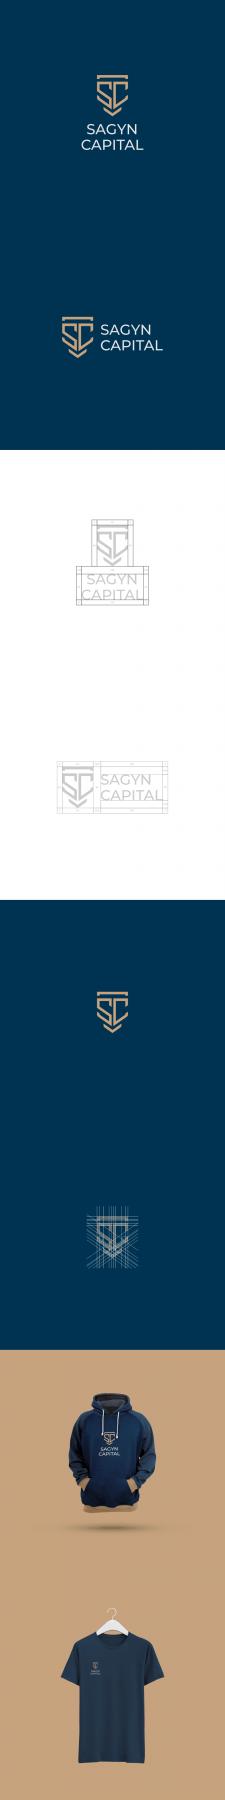 Sagyn Capital